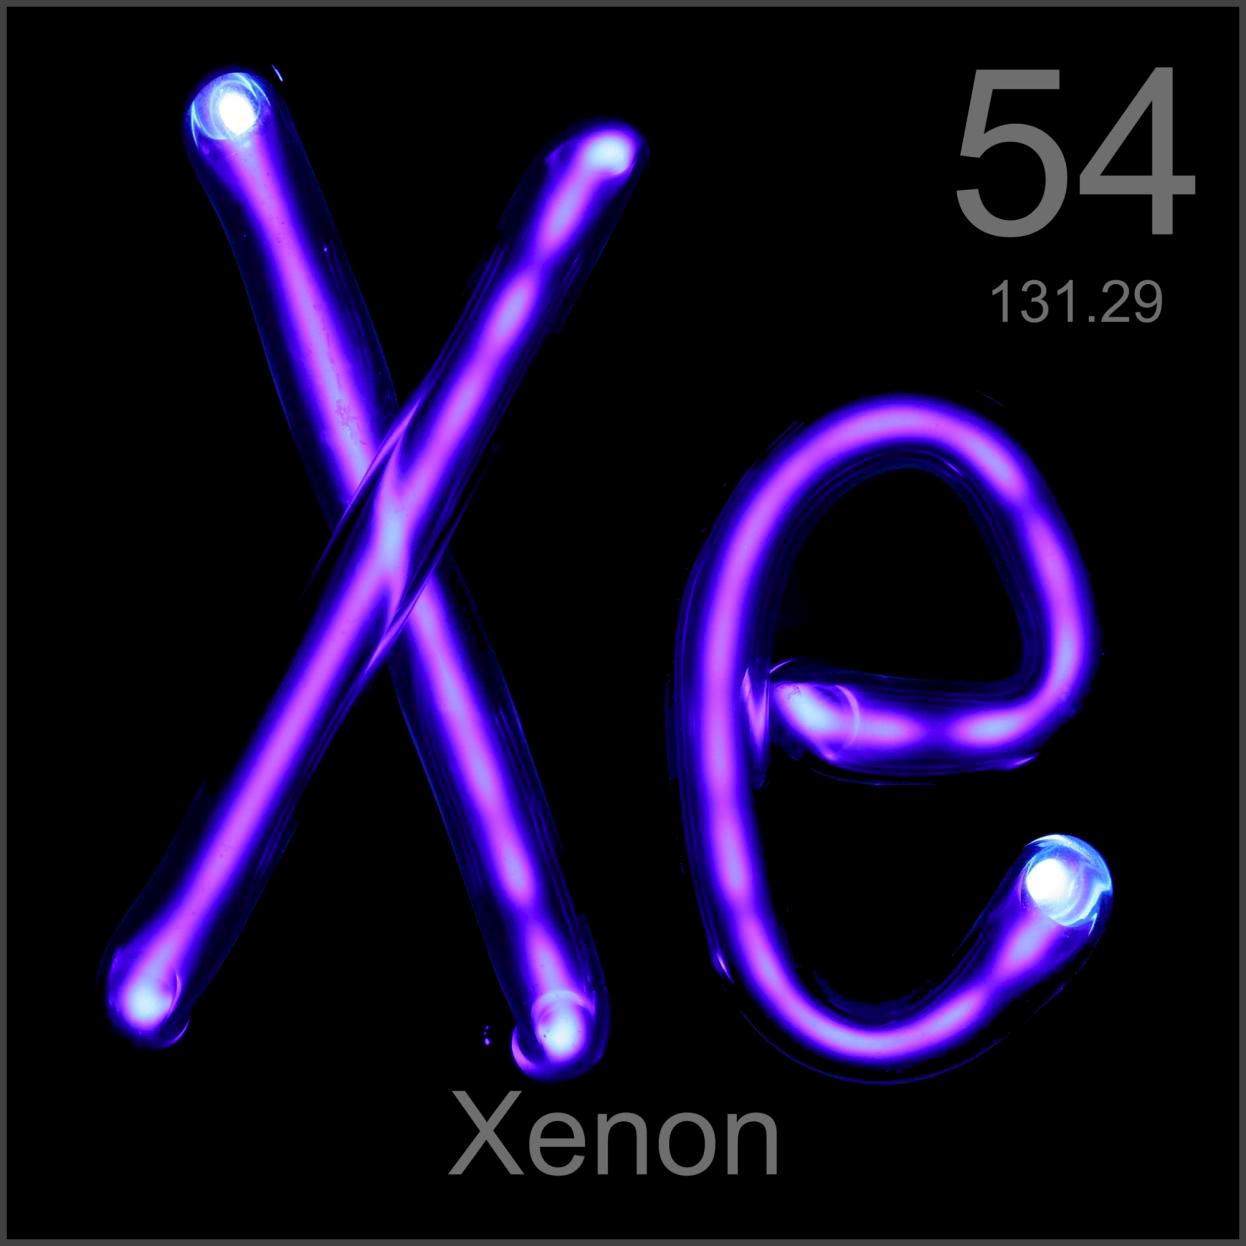 Xenon Periodic Table Facts, pictures, stori...